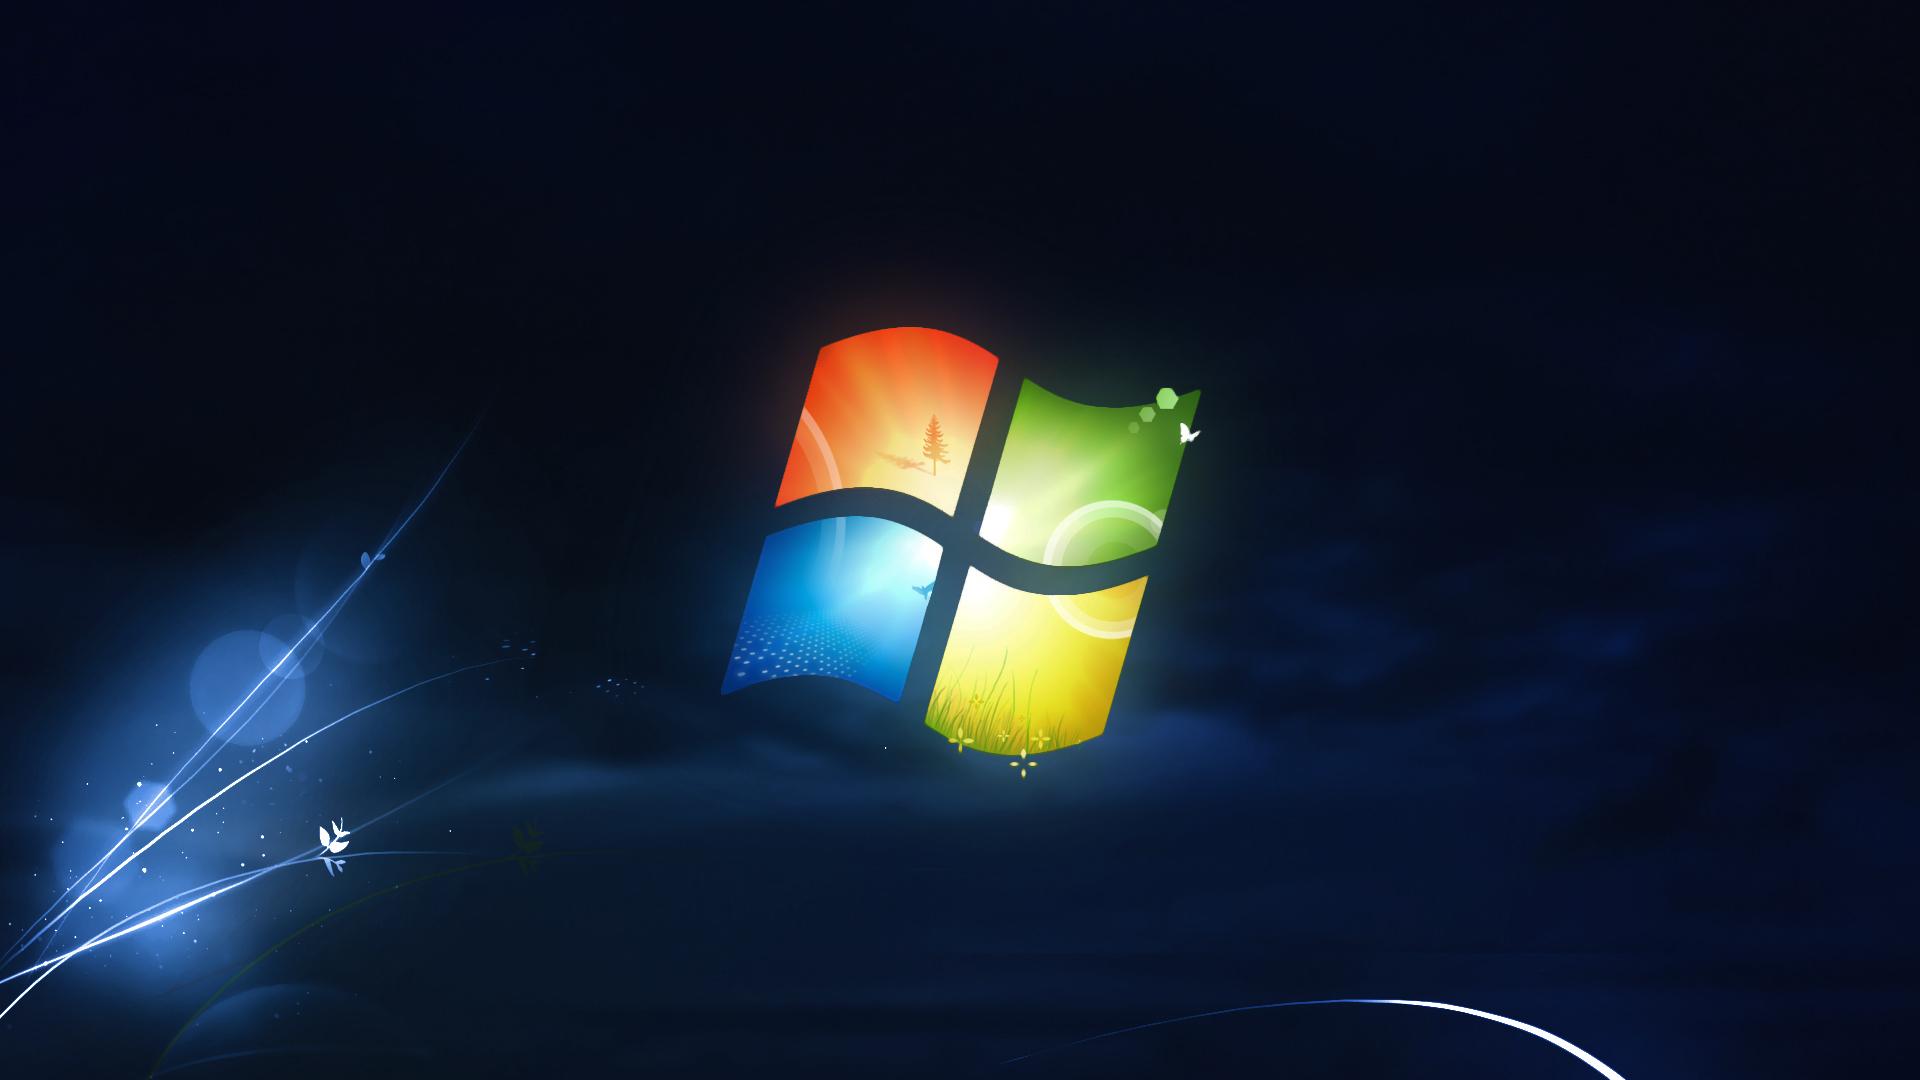 Free Download Windows 7 Black Wallpaper Hd Wallpaper 796606